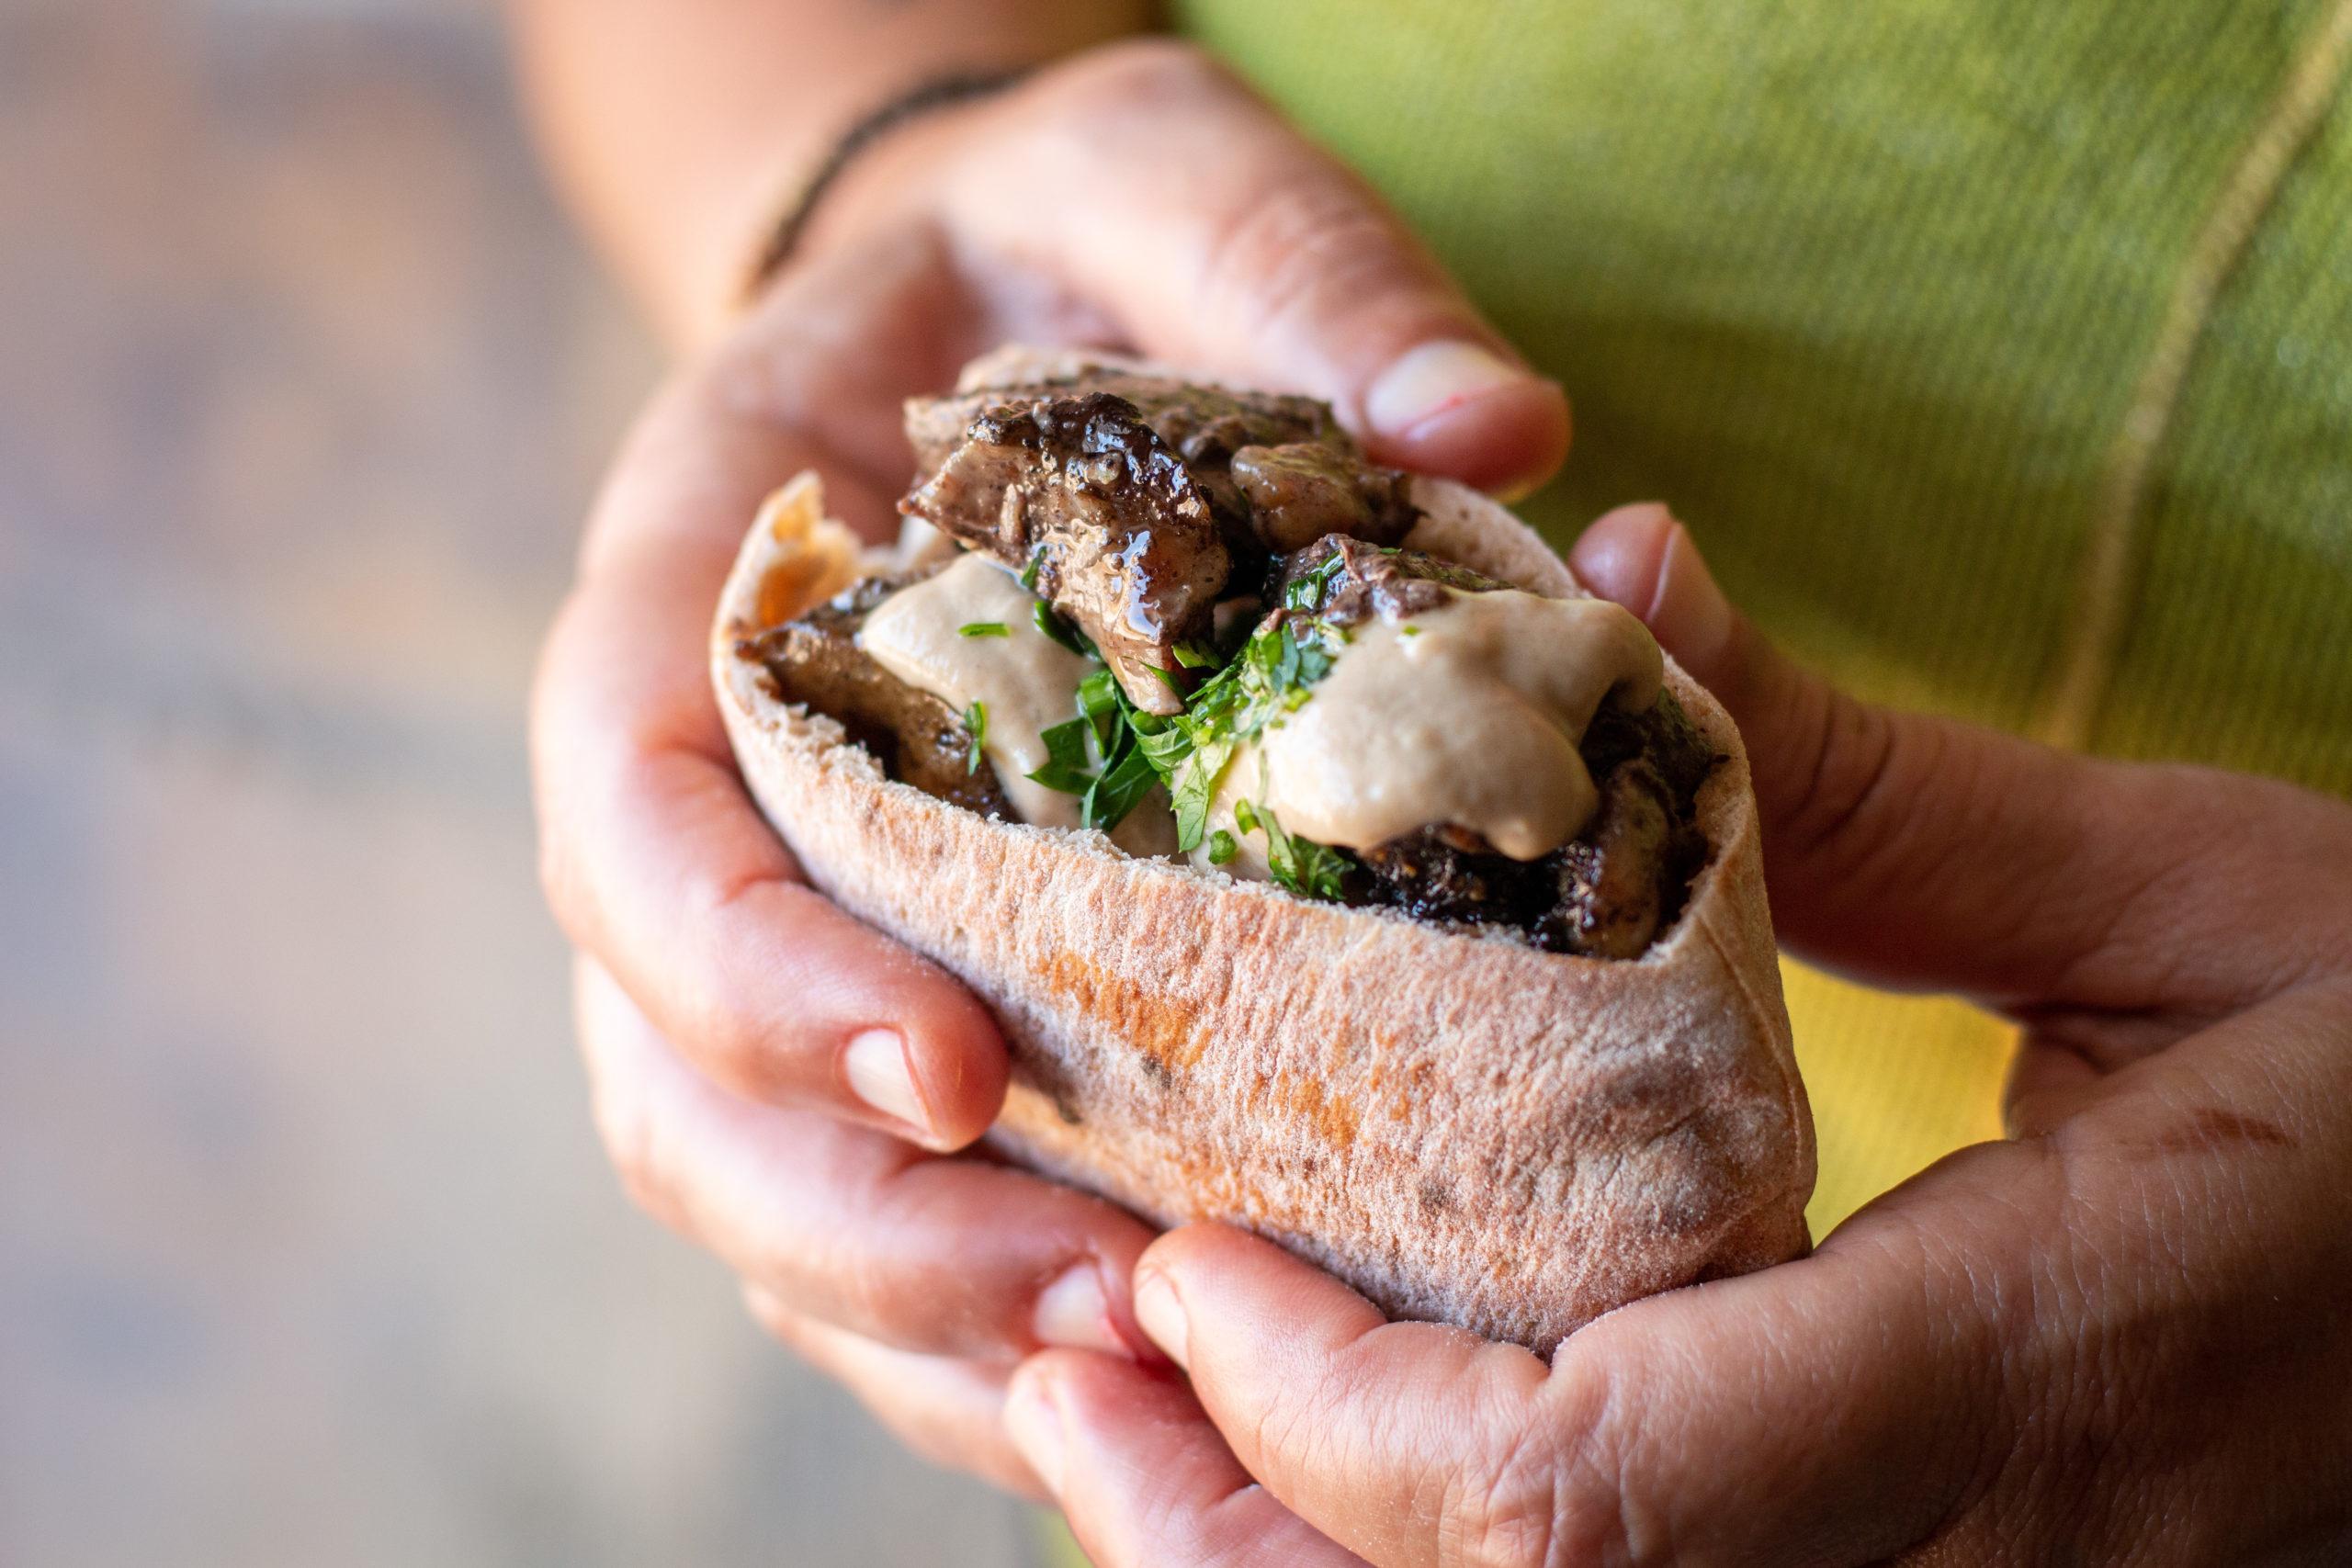 معلاق مشوي داخل خبز عربي مع طحينه تمسكه يدان